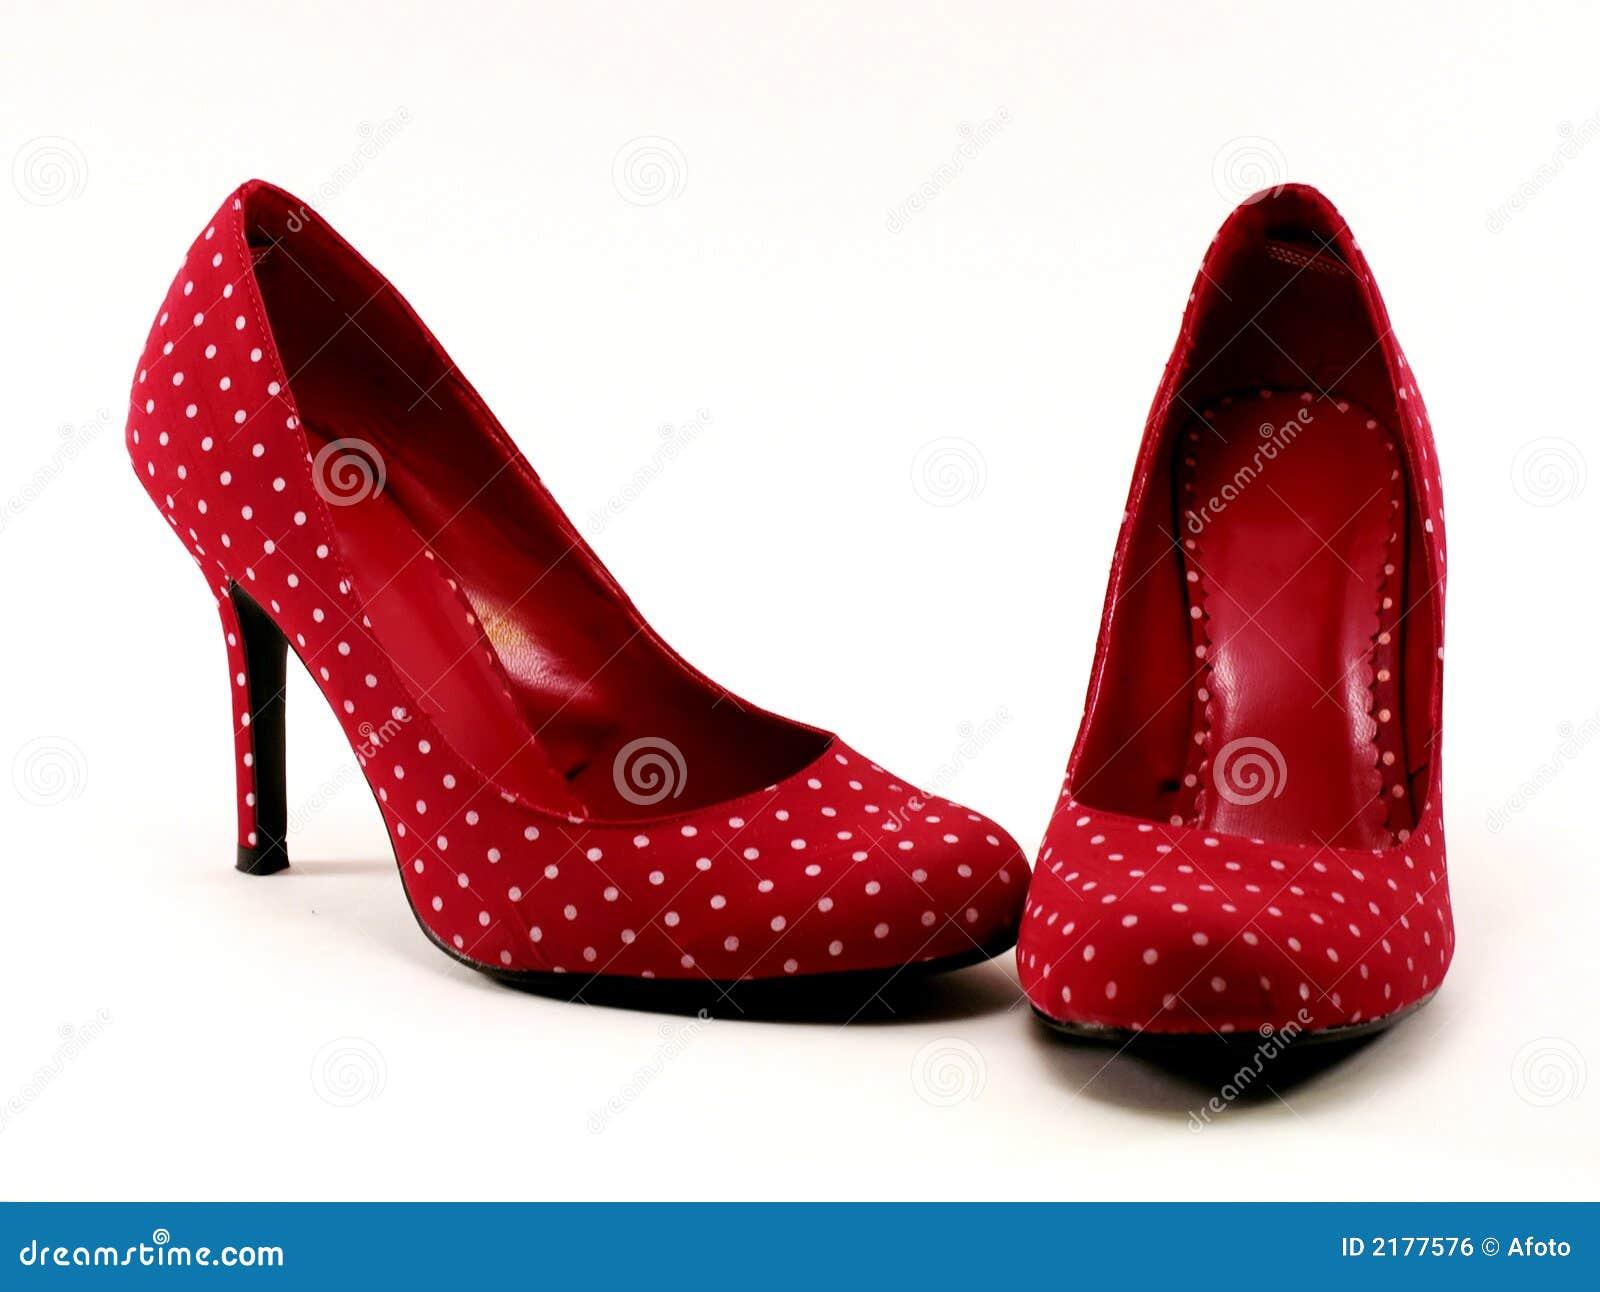 Free high heel pics